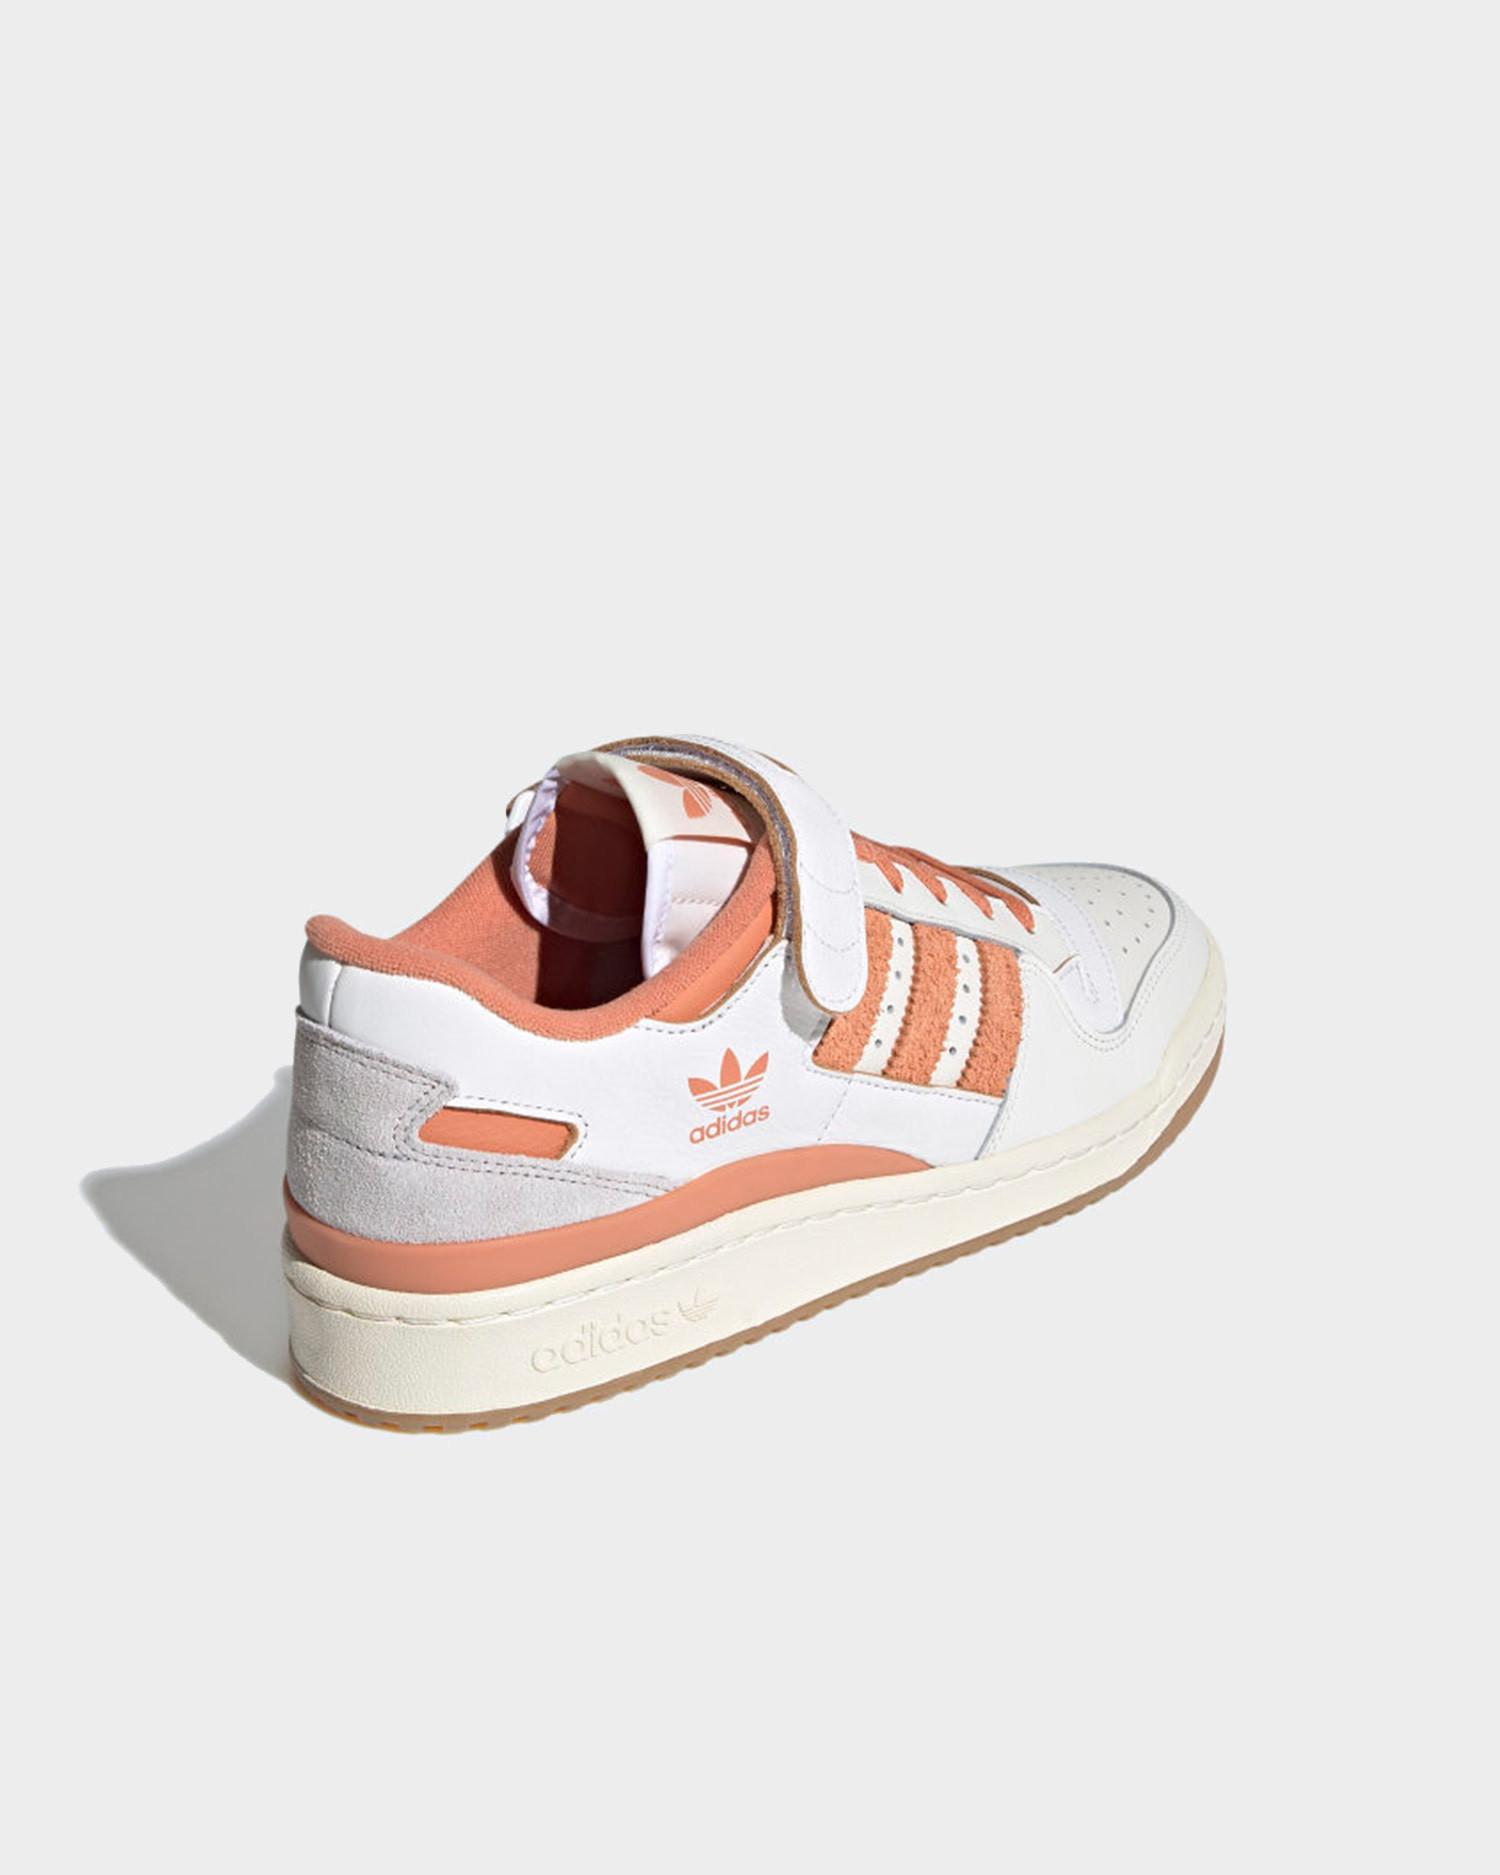 adidas Forum 84 Low White/Hazy Copper